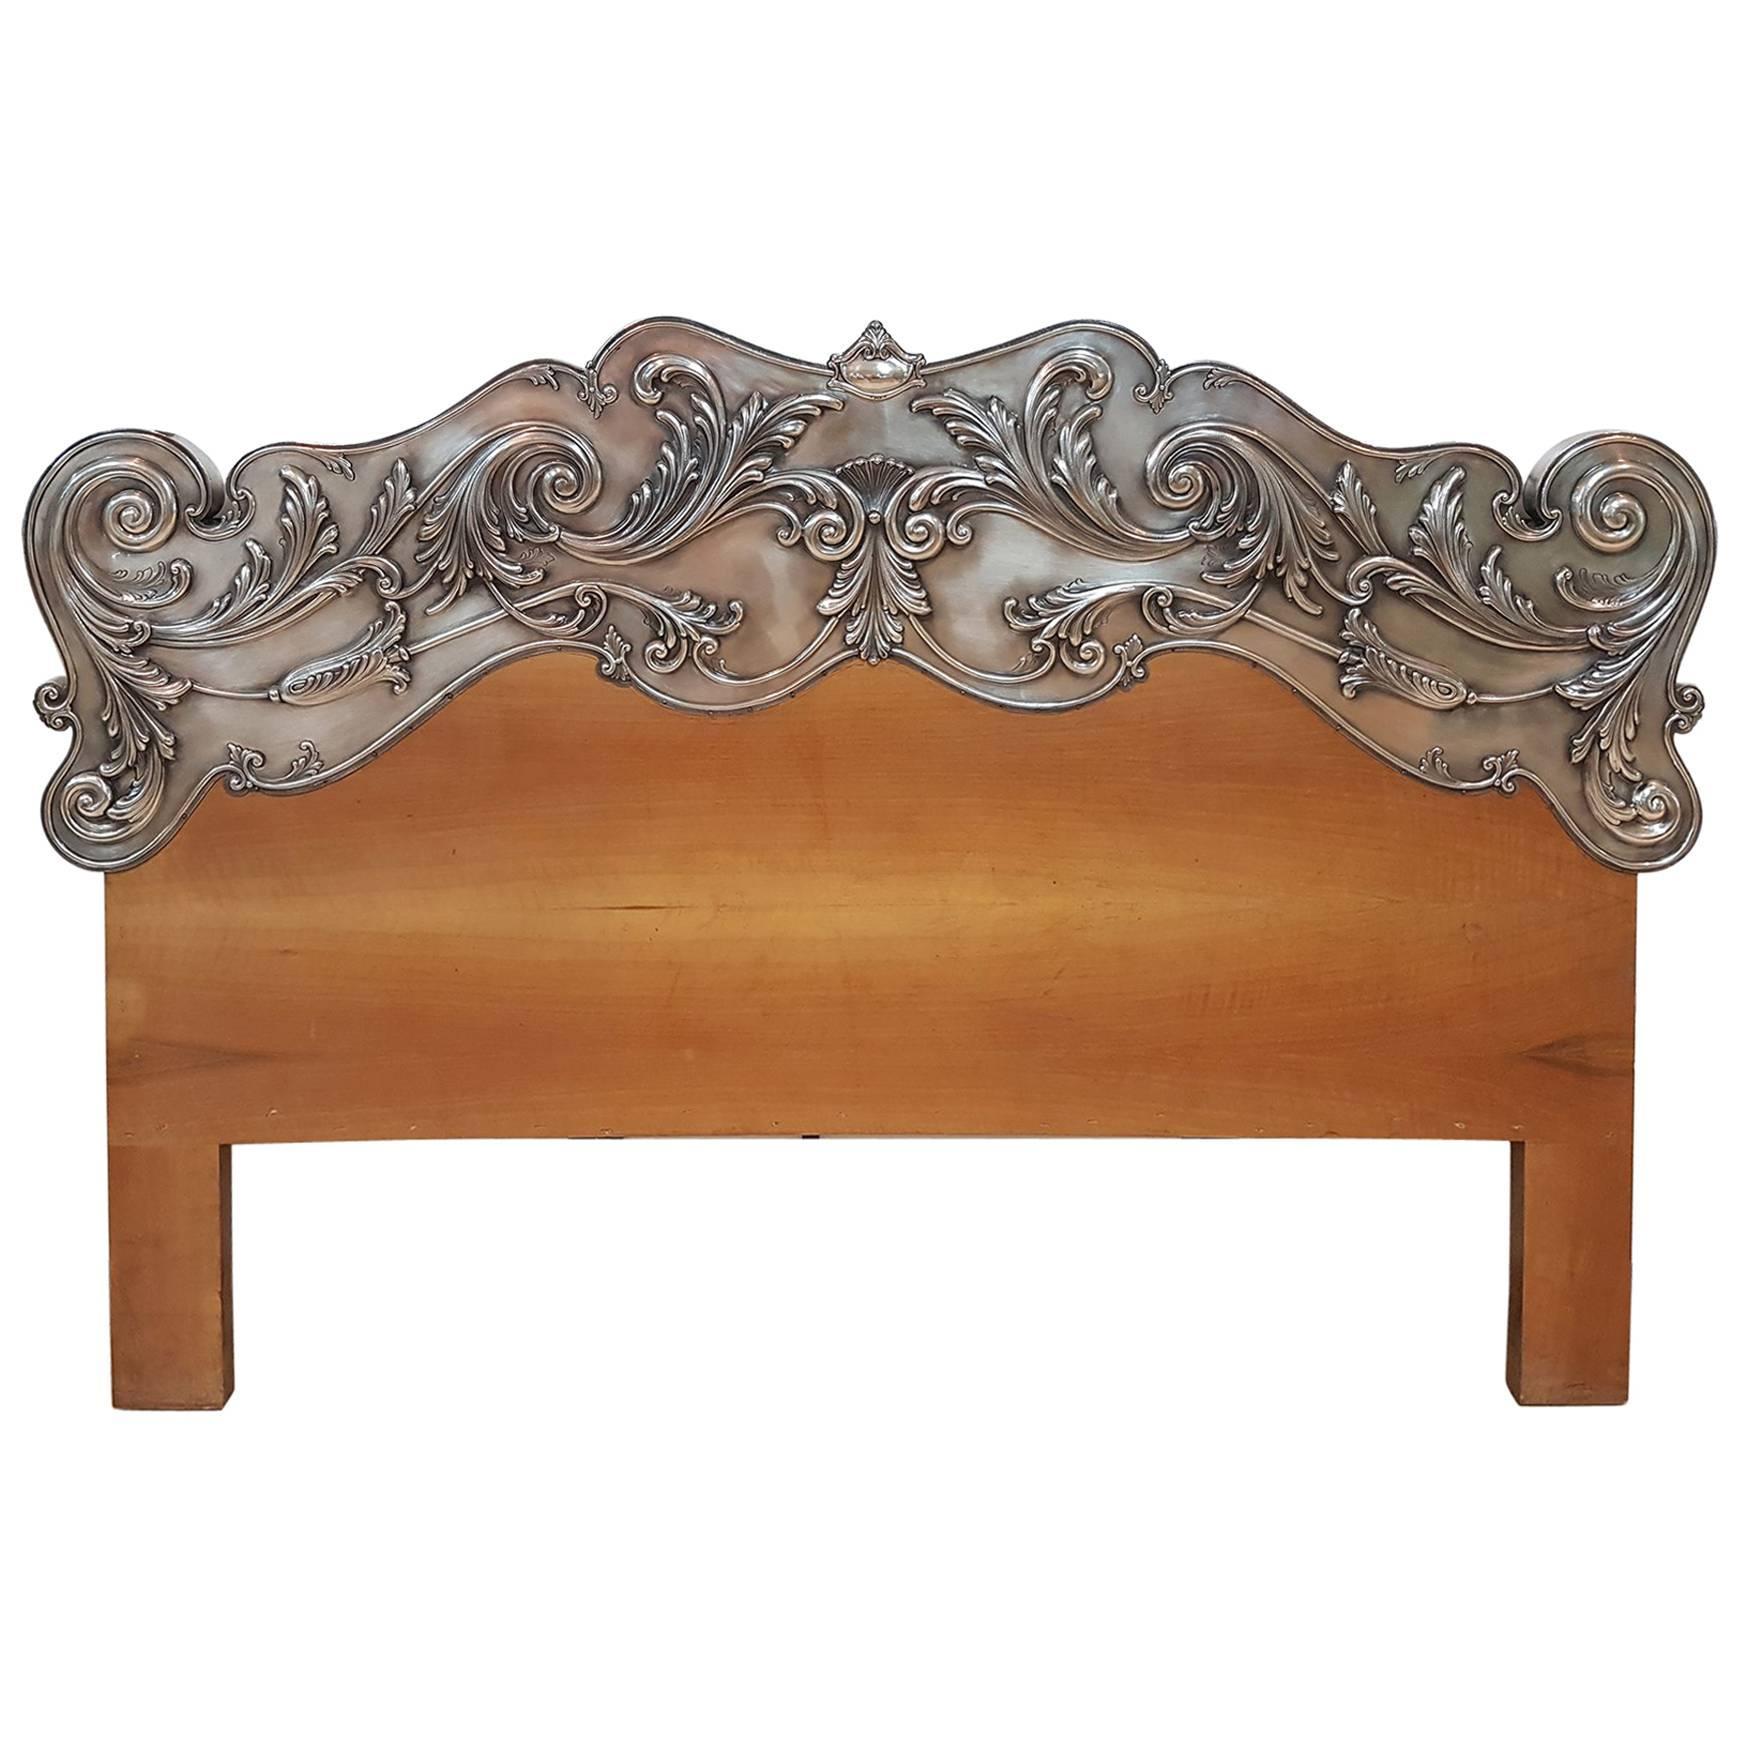 20th Century Italian Sterling Silver Head Bed, baroque barocco revival